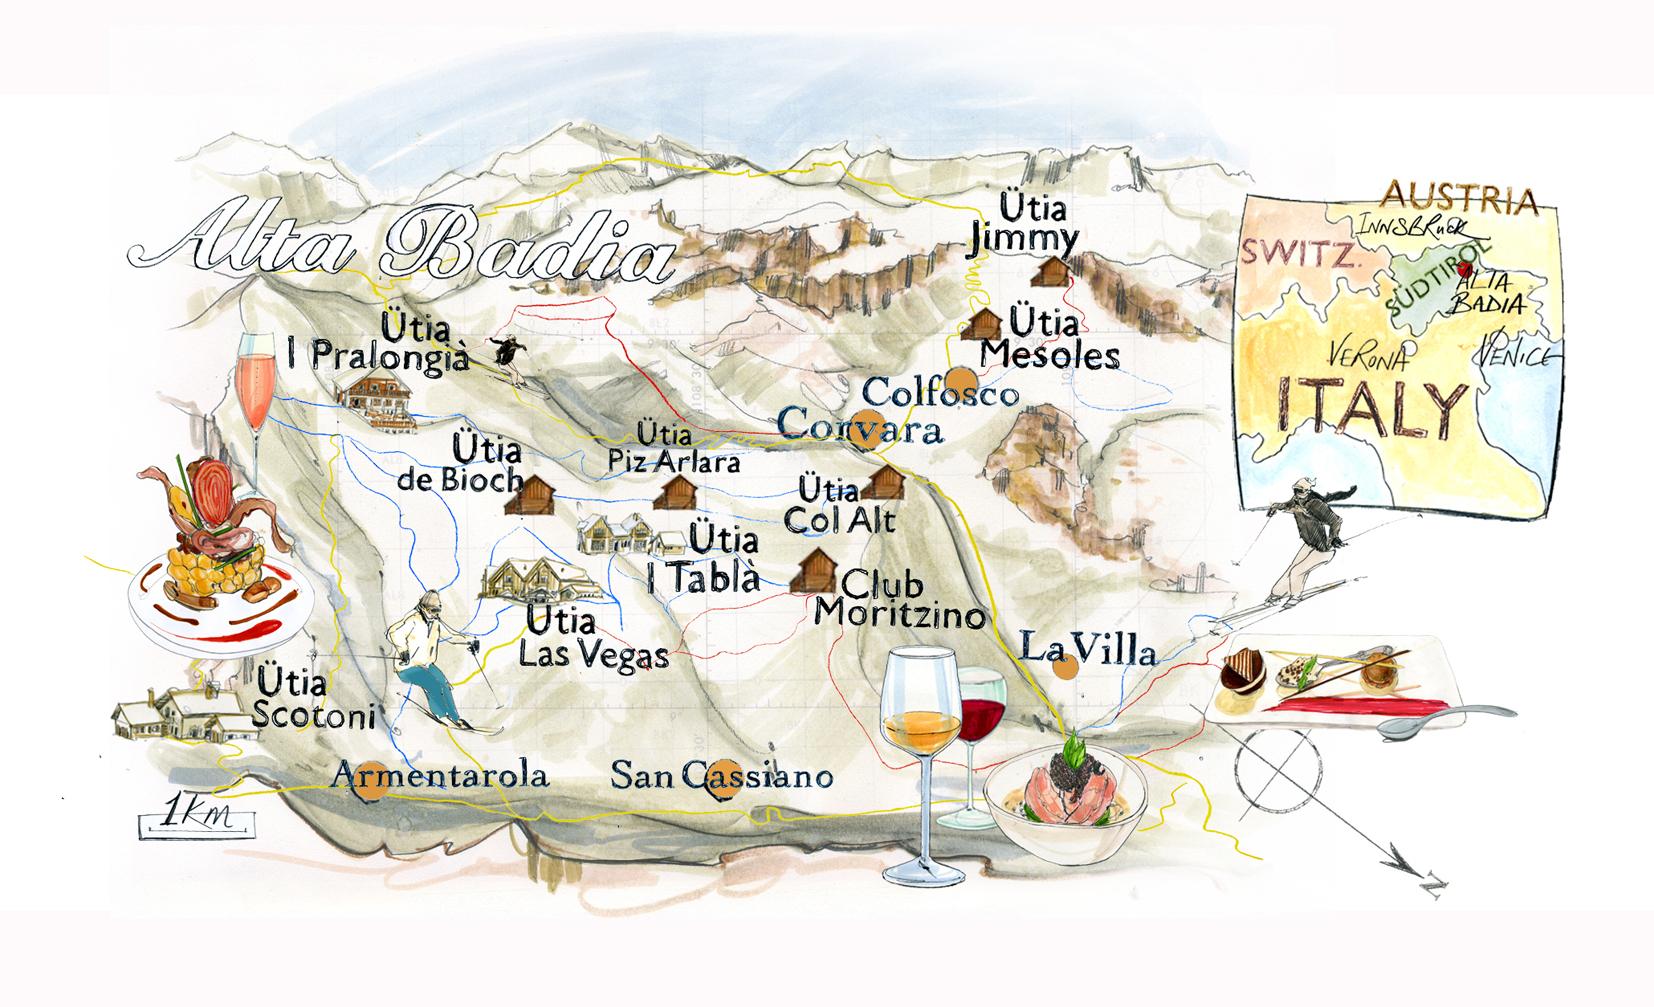 Alta Badia Ski Food And Lodge Map Conde Nast Traveller